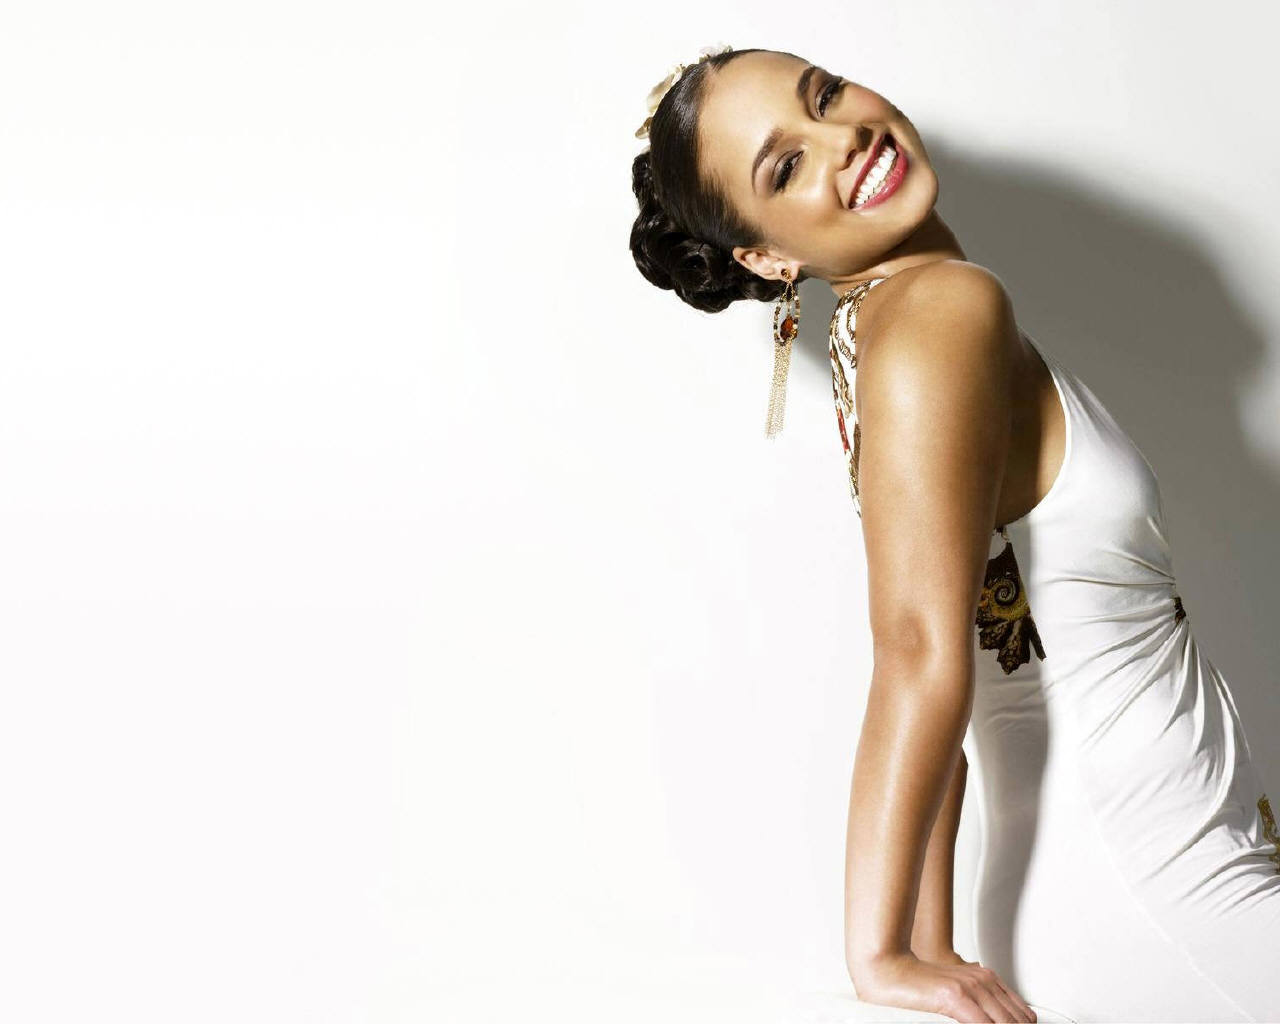 http://4.bp.blogspot.com/-9gdIAbATdQk/T4EIp26KqgI/AAAAAAAAErg/tiOFh3PoaS4/s1600/Alicia+Keys\'+elegant+sense+of+womanhood+3.jpg